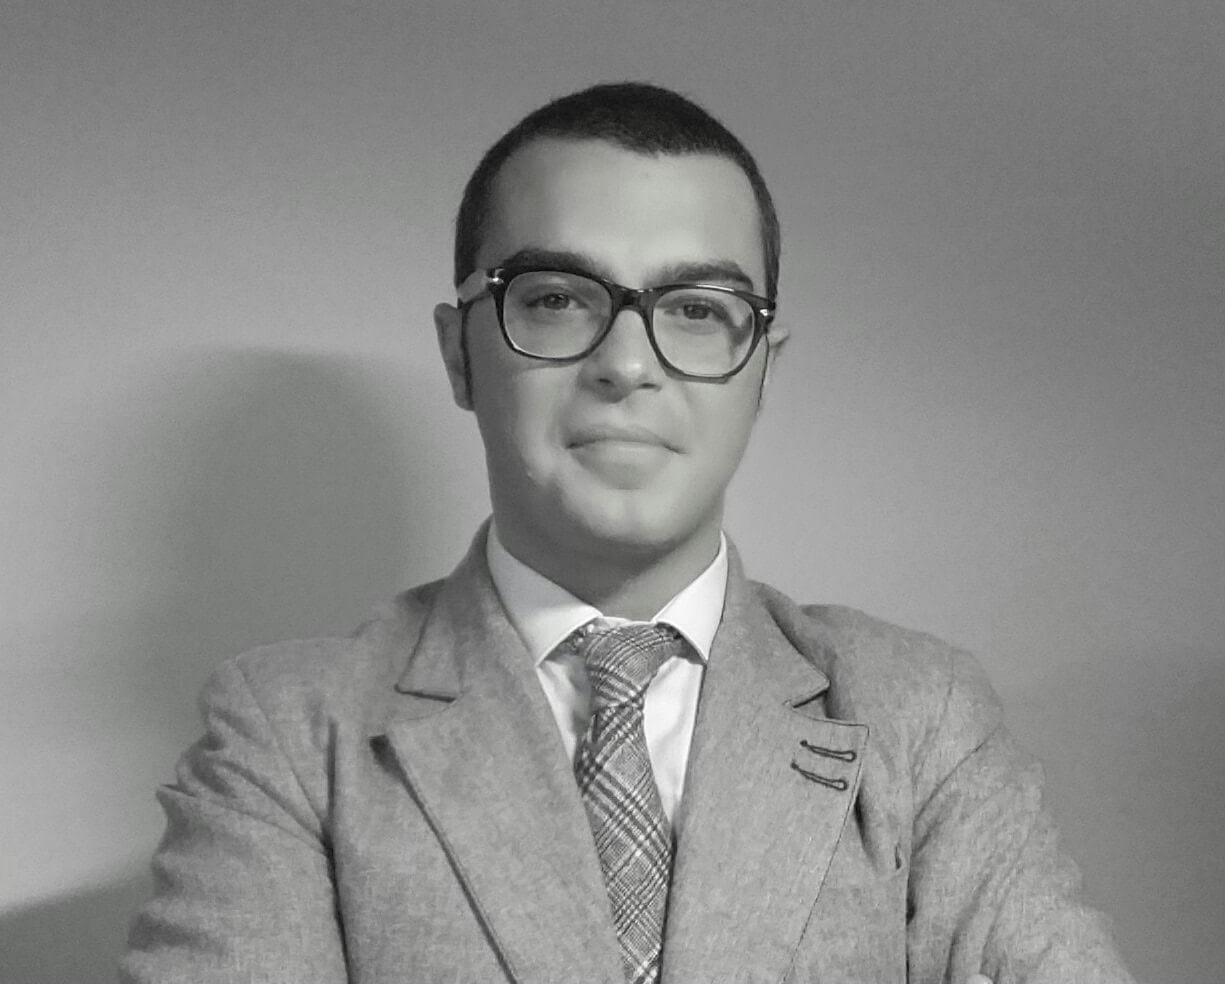 Matteo Moscioni